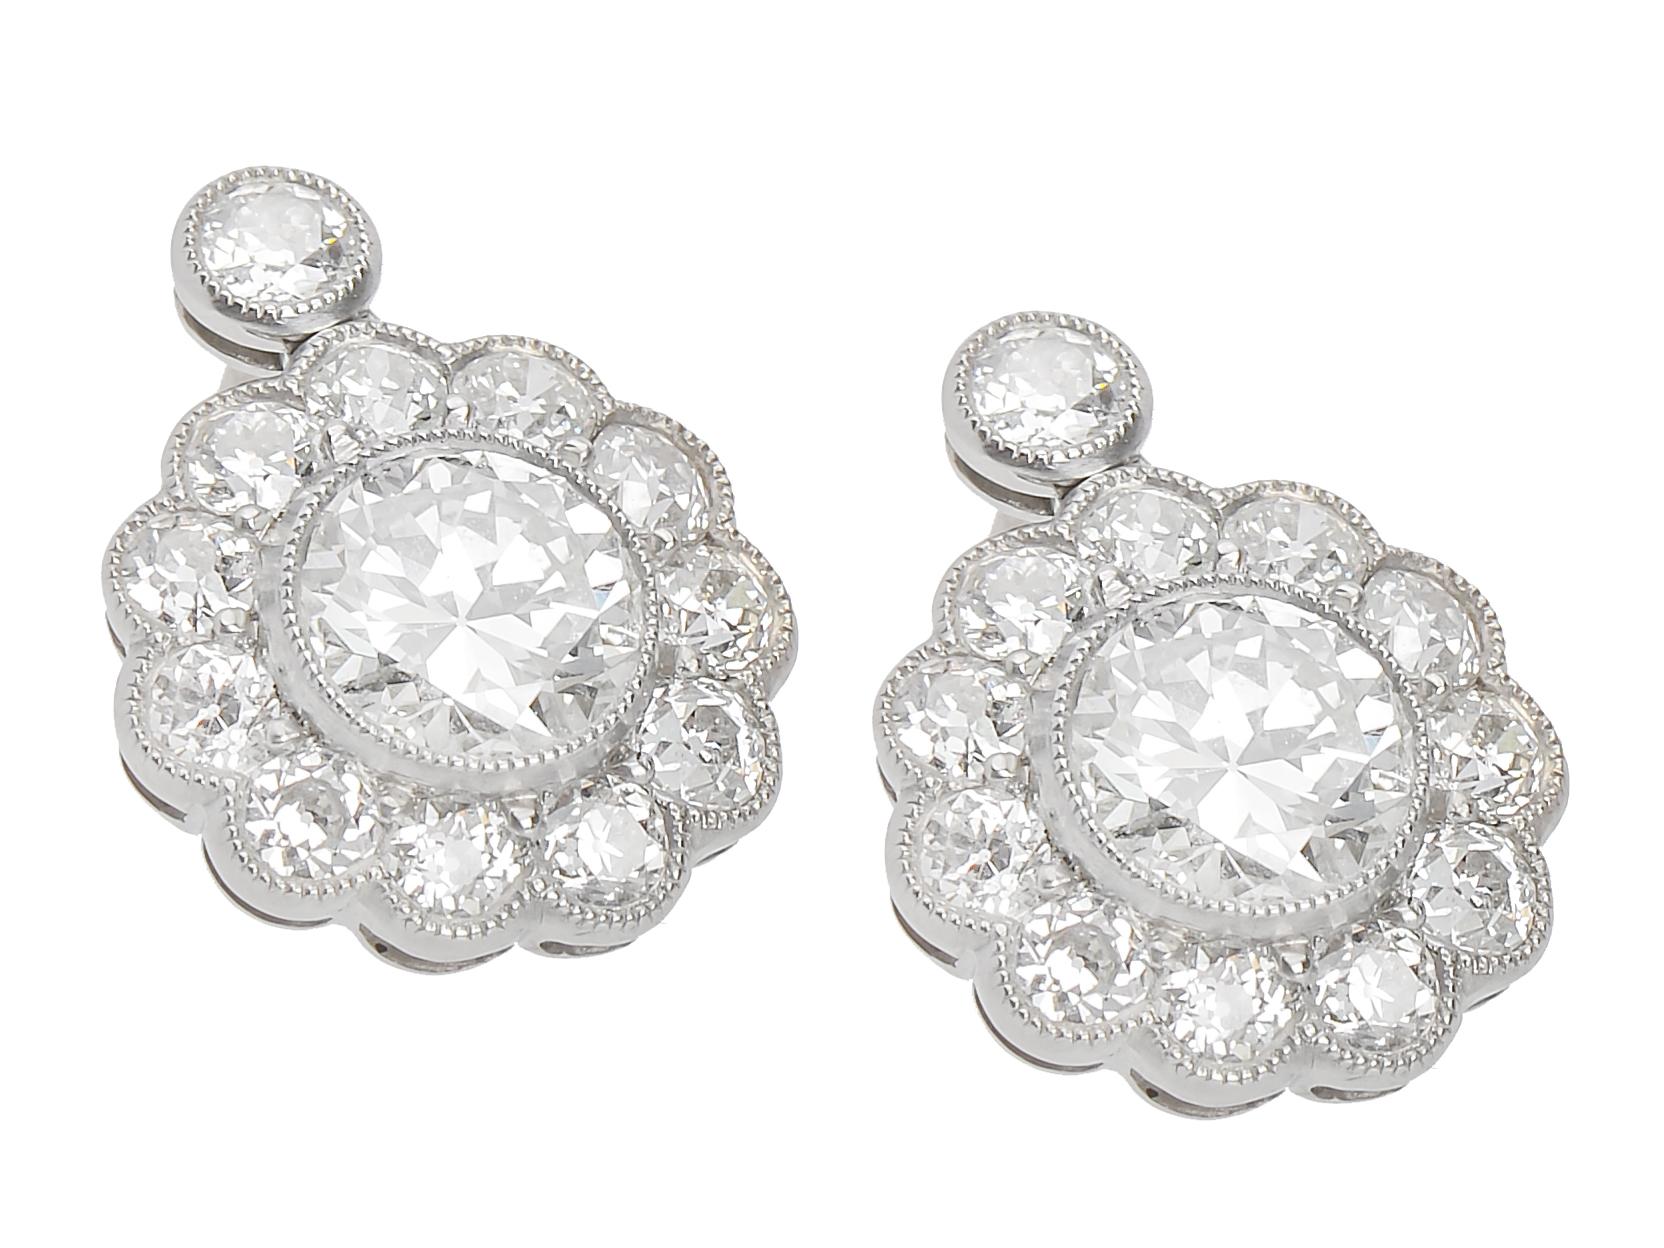 2.5ct Created Diamond Basket Stud Earrings 14K Solid White Gold ScrewBack JM16